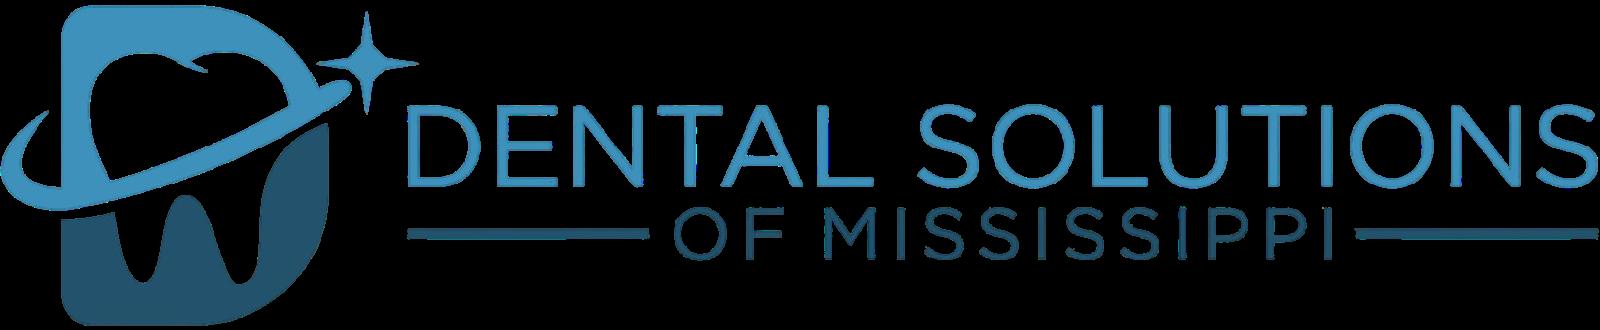 Dental solutions of mississippi logo